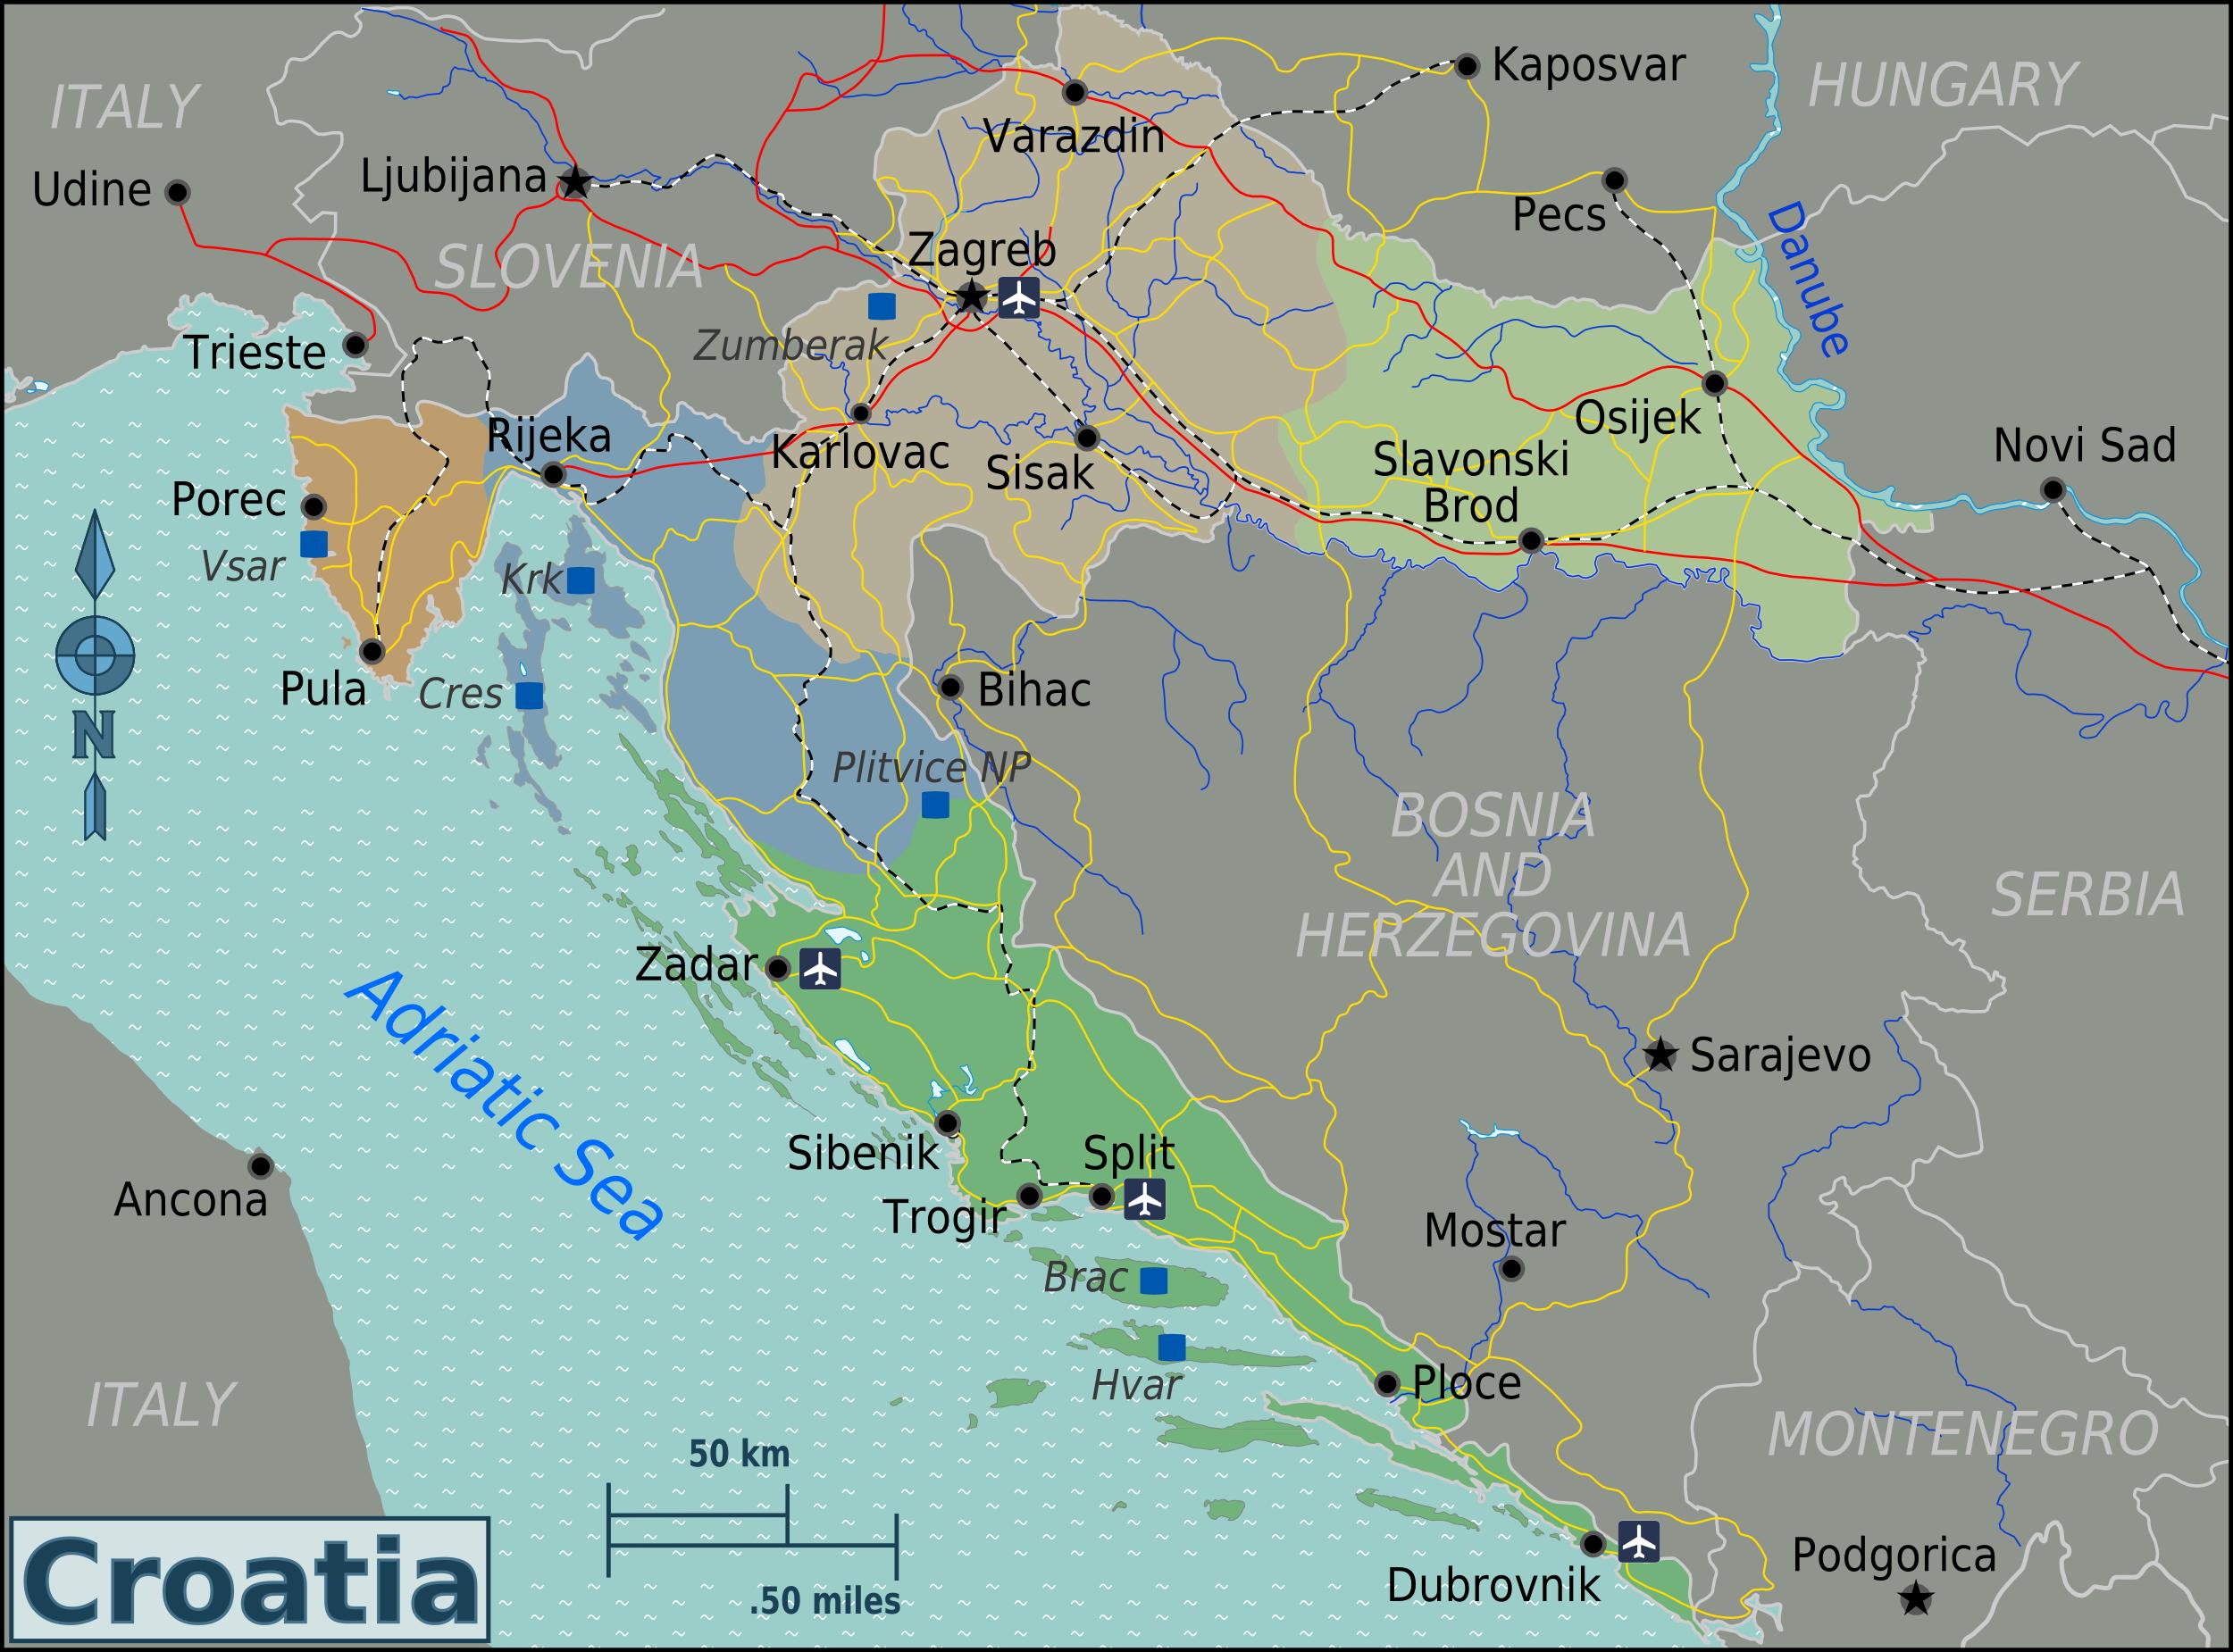 landkarte kroatien bersichtskarte regionen weltkarte. Black Bedroom Furniture Sets. Home Design Ideas